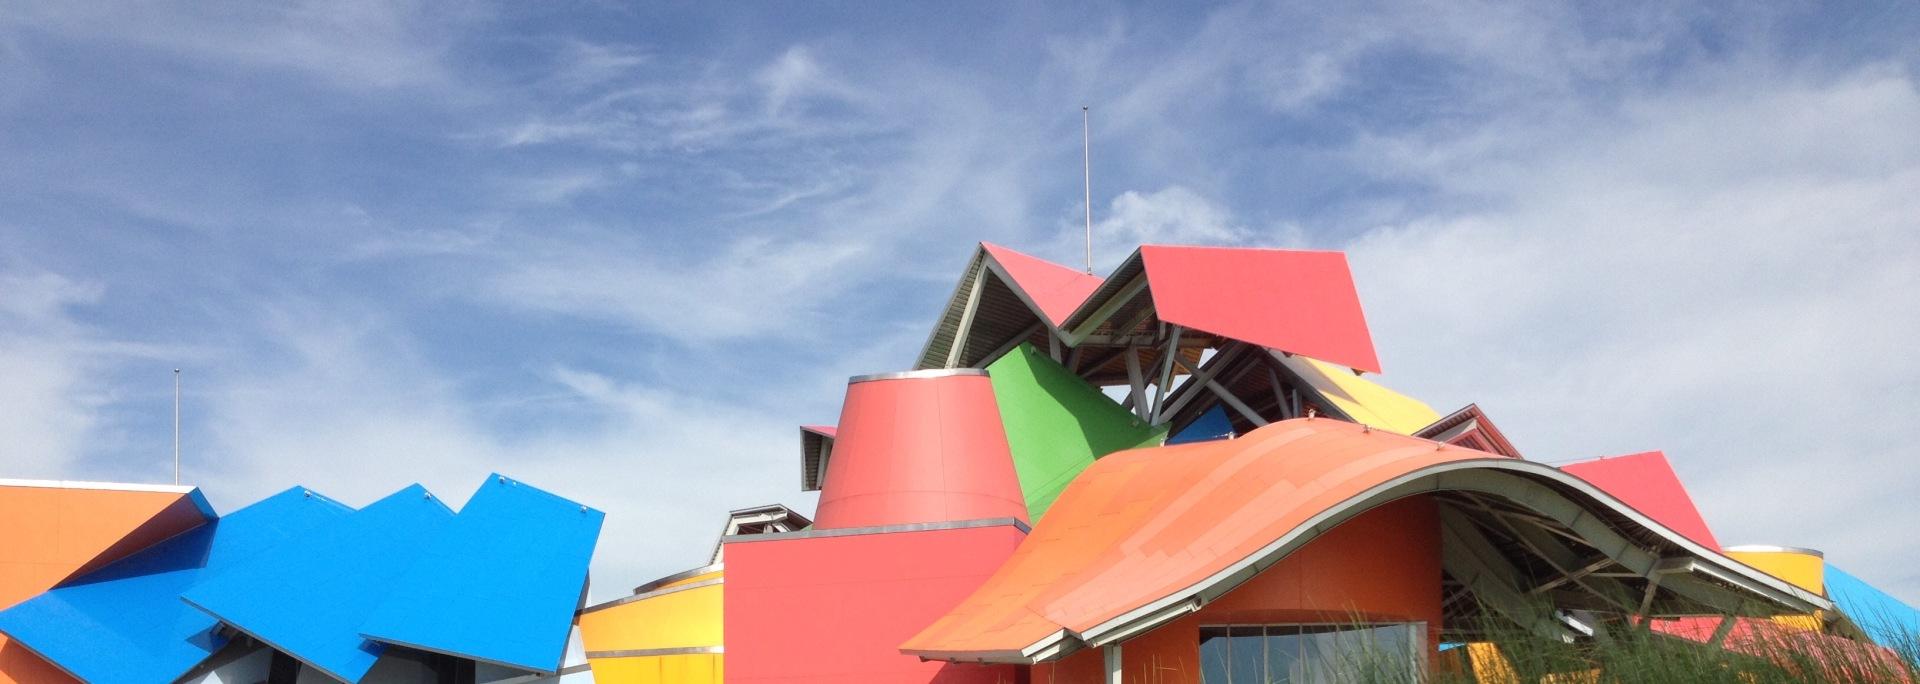 Biomuseo de Panama, Causeway